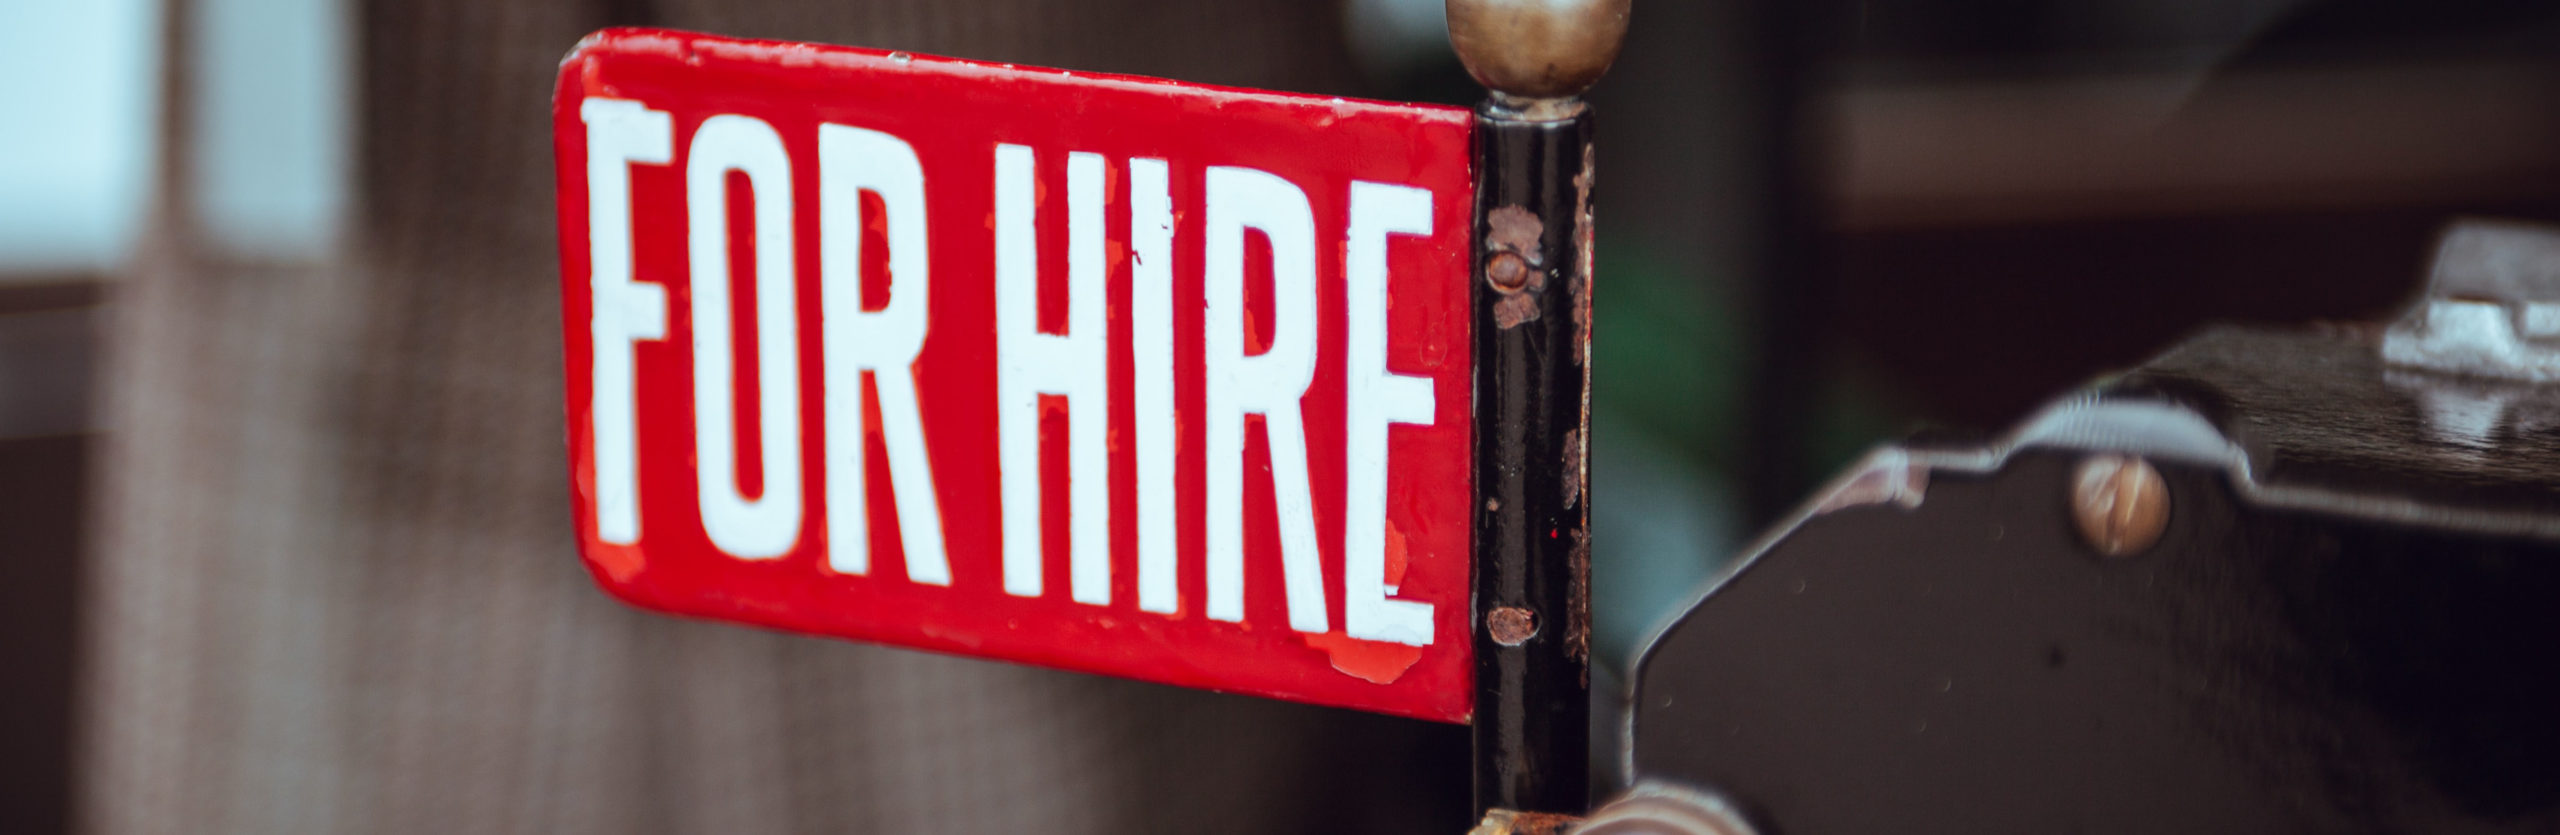 Working One Full-Time Job Vs. Multiple Part-Time Jobs